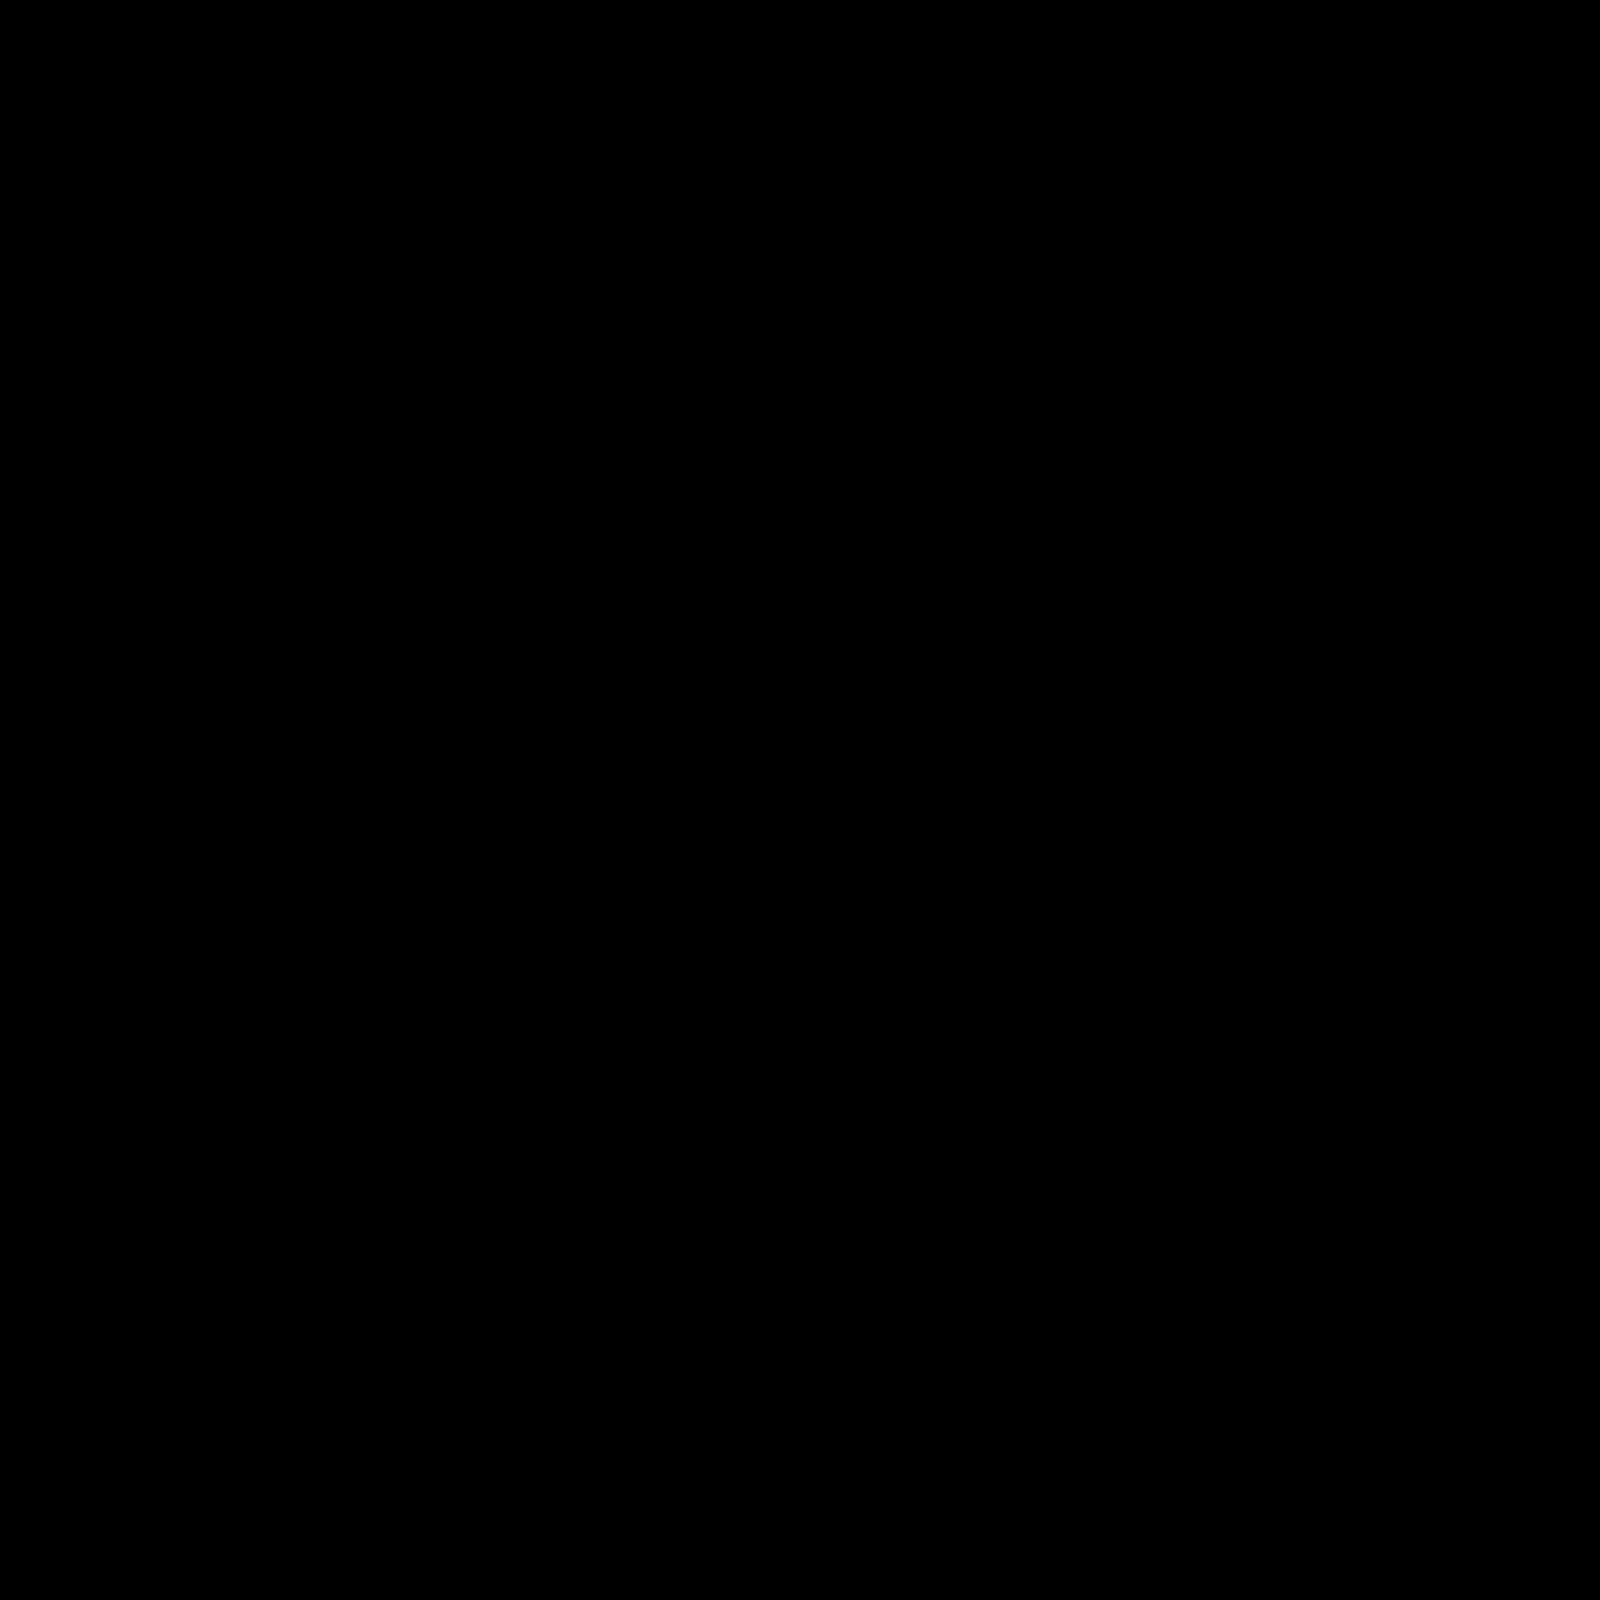 Overhead Crane Filled icon